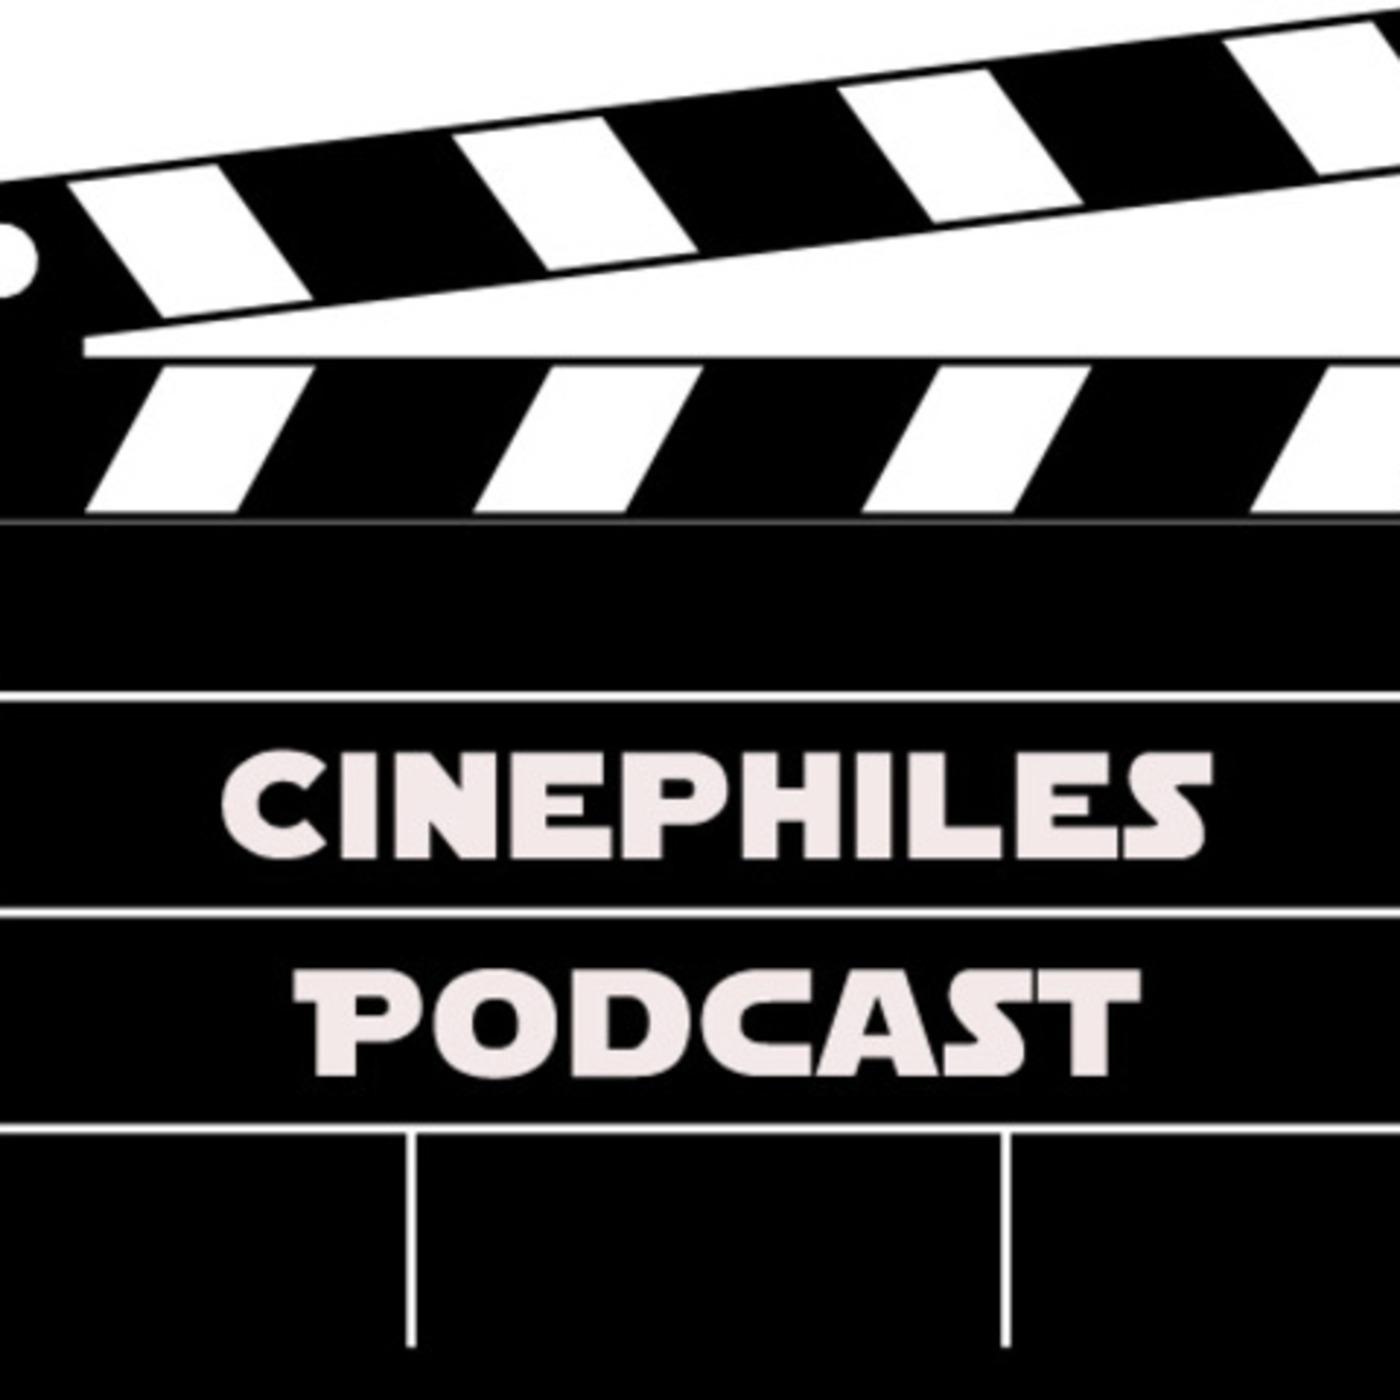 Cinephiles Podcast